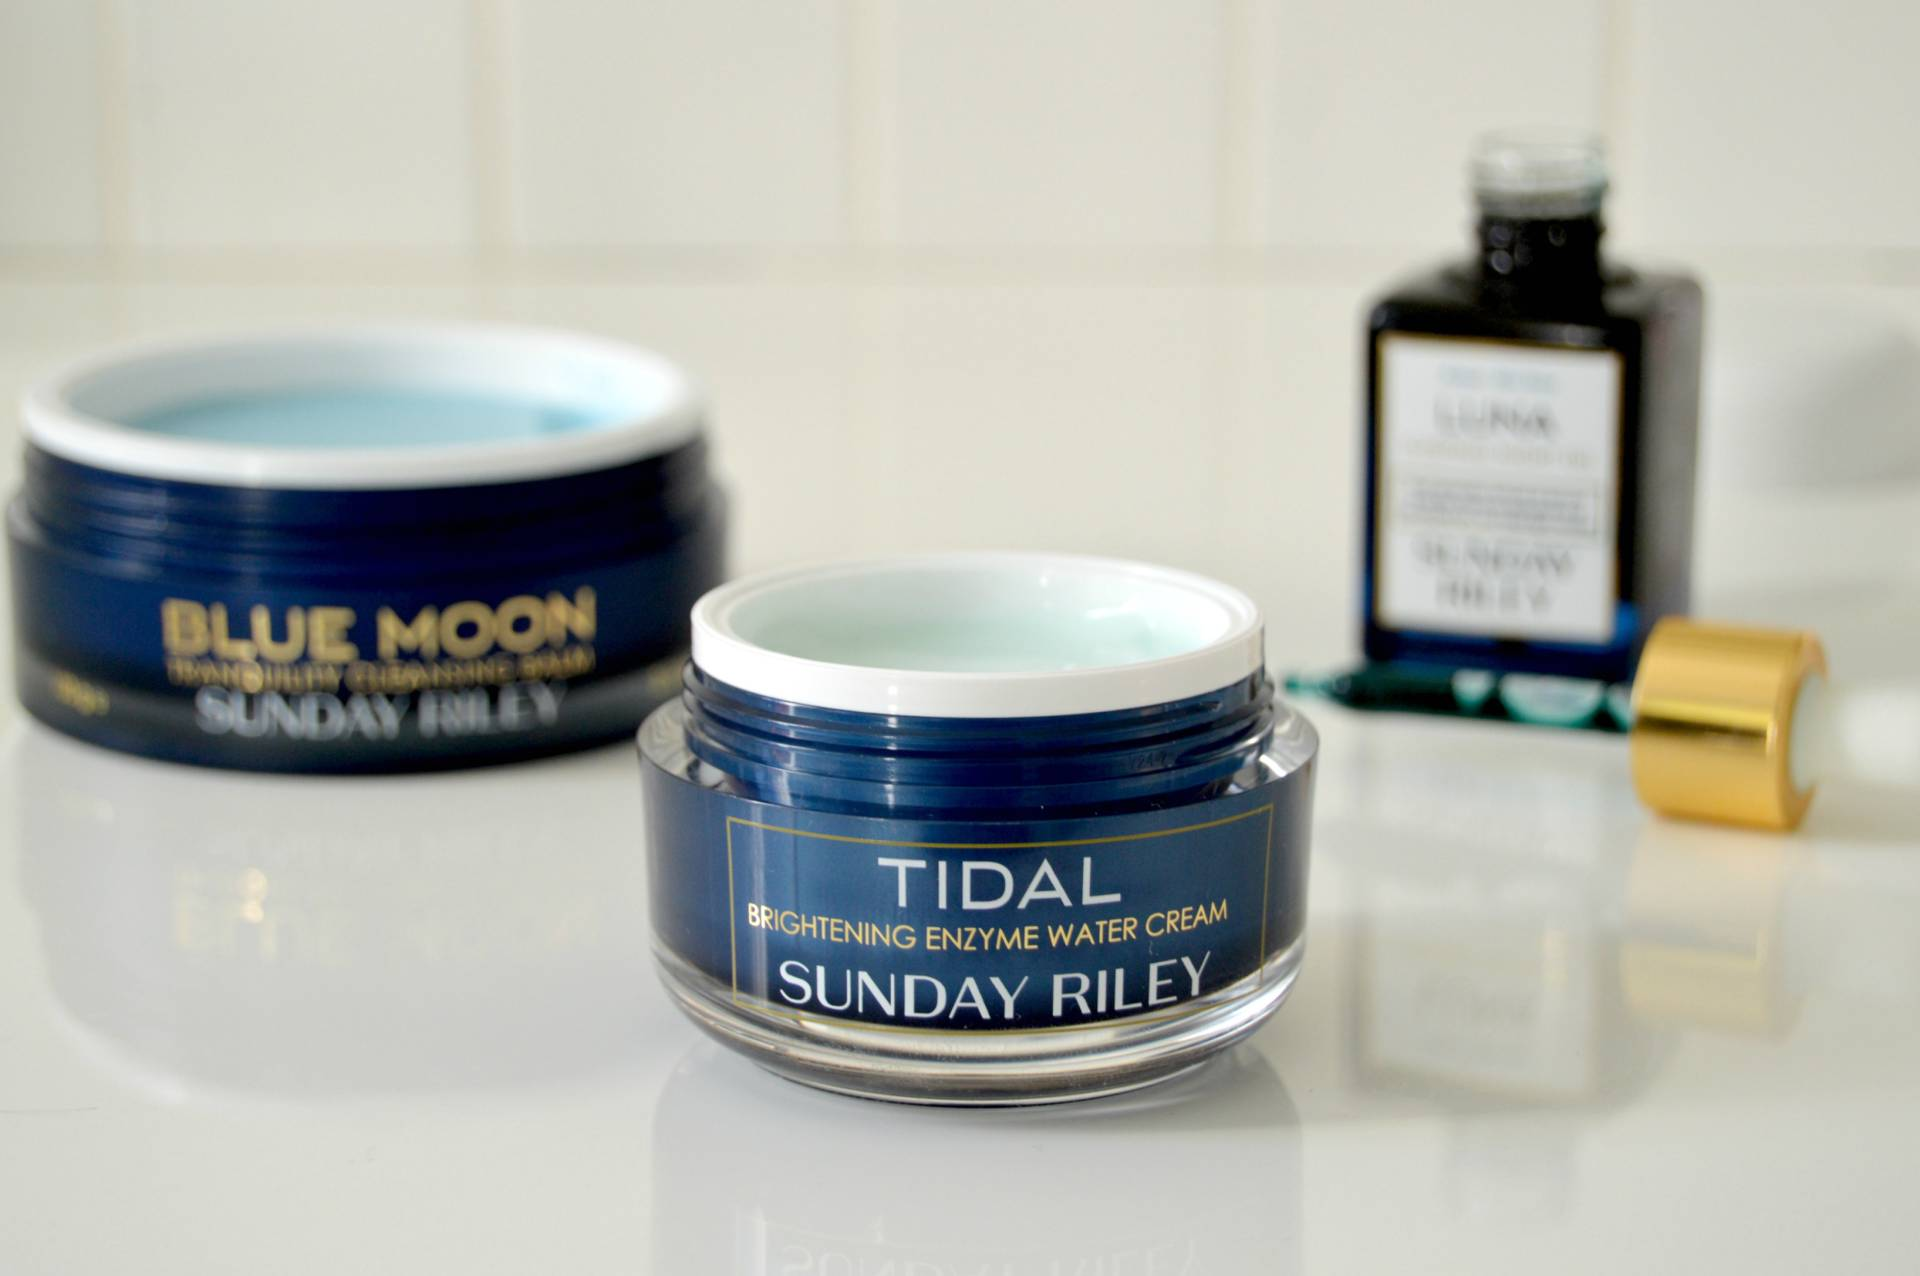 sunday riley blue moon tidal enzyme cream luna oil review inhautepursuit